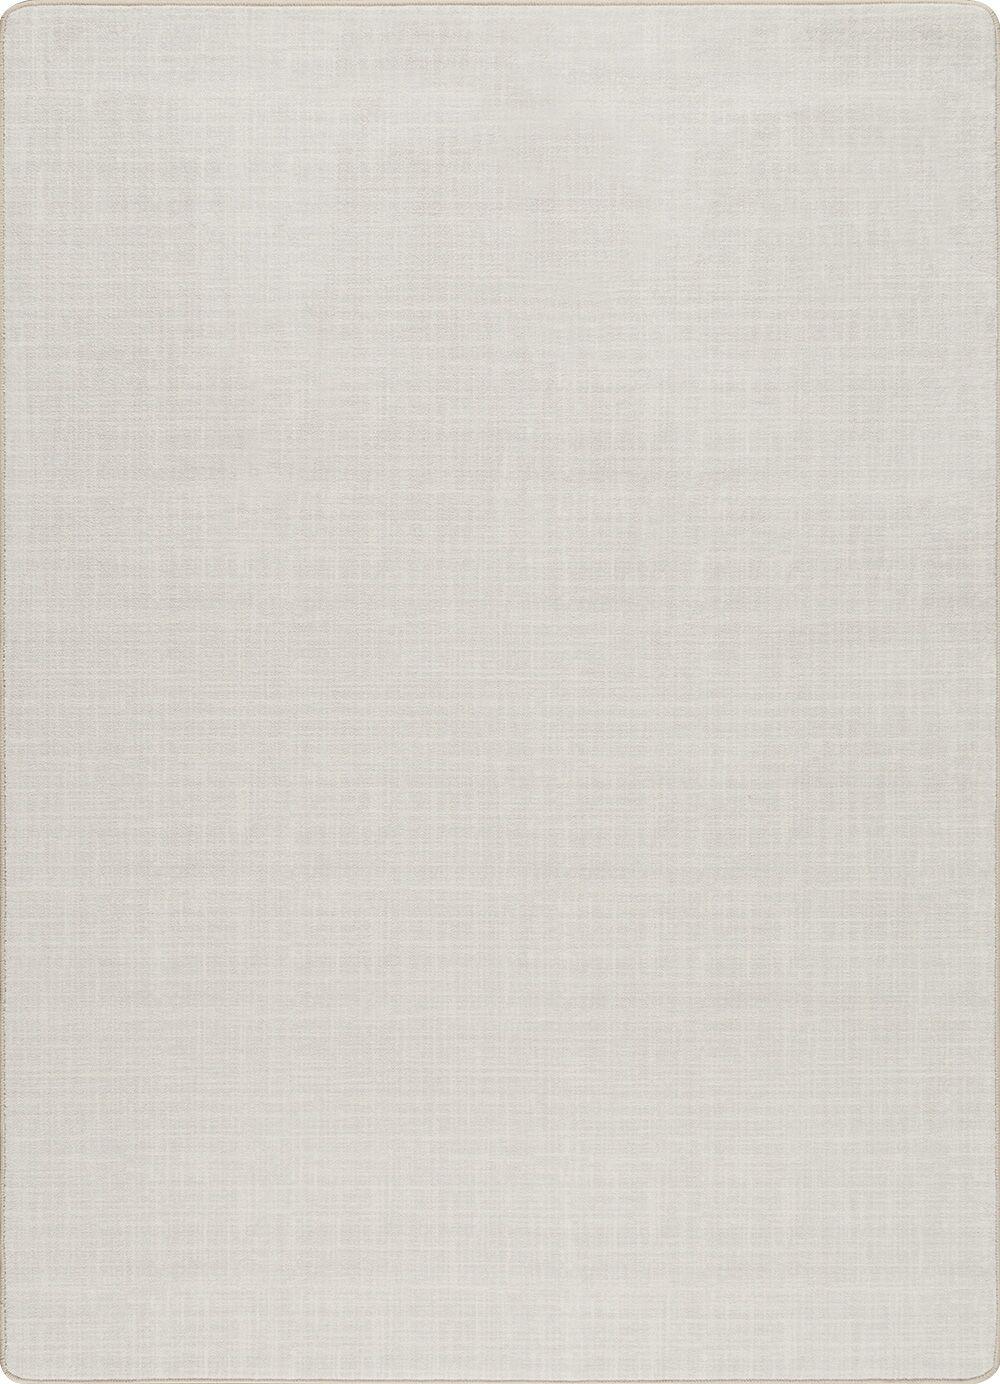 Risborough Alabaster Area Rug Rug Size: Rectangle 3'10